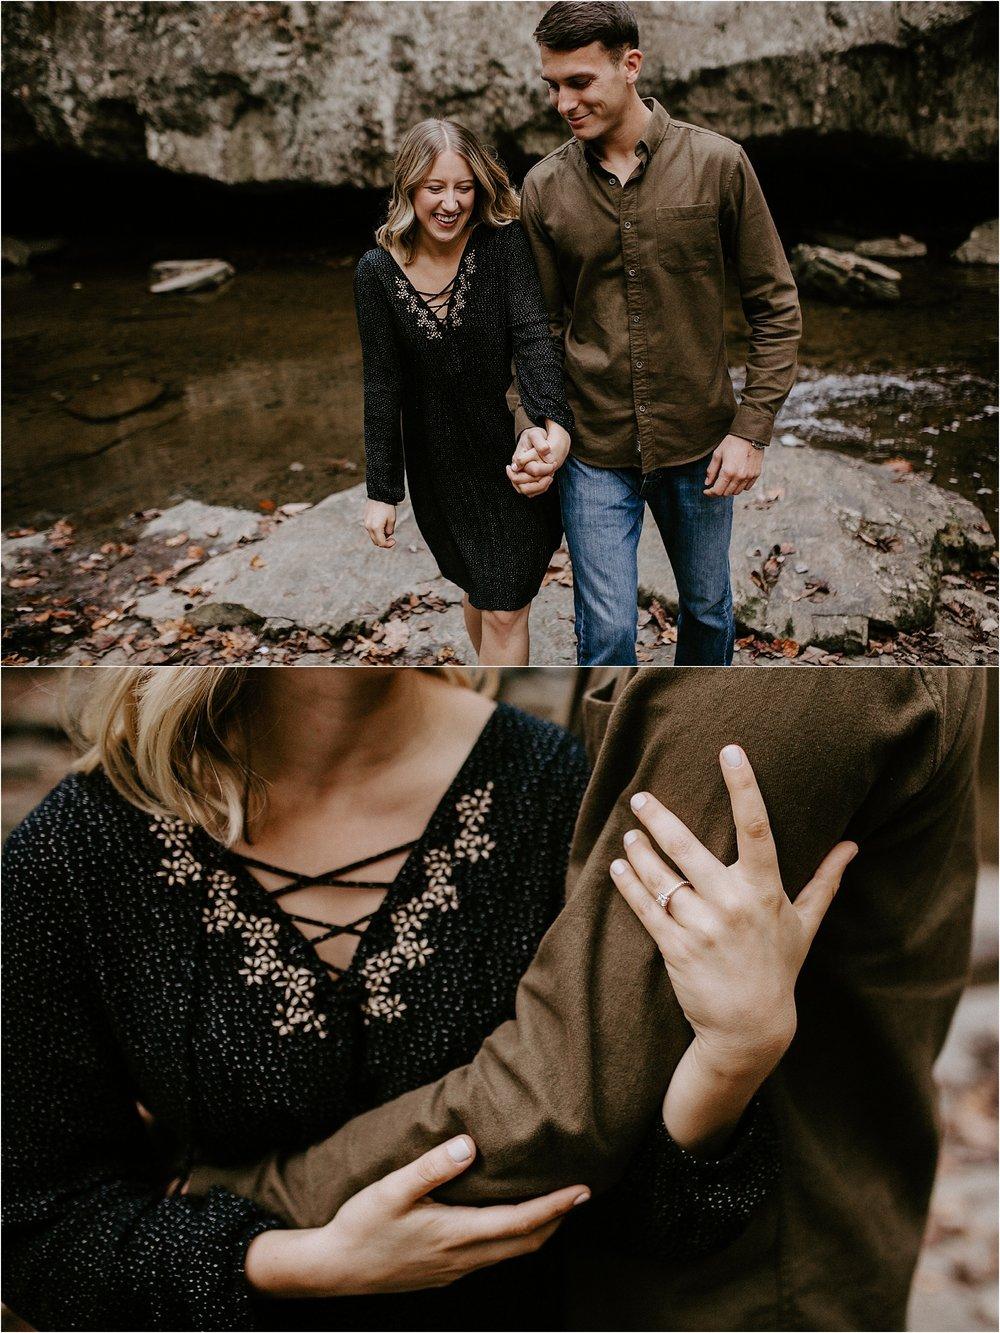 Sarah_Brookhart_PA_MD_Wedding_Photographer_0003.jpg